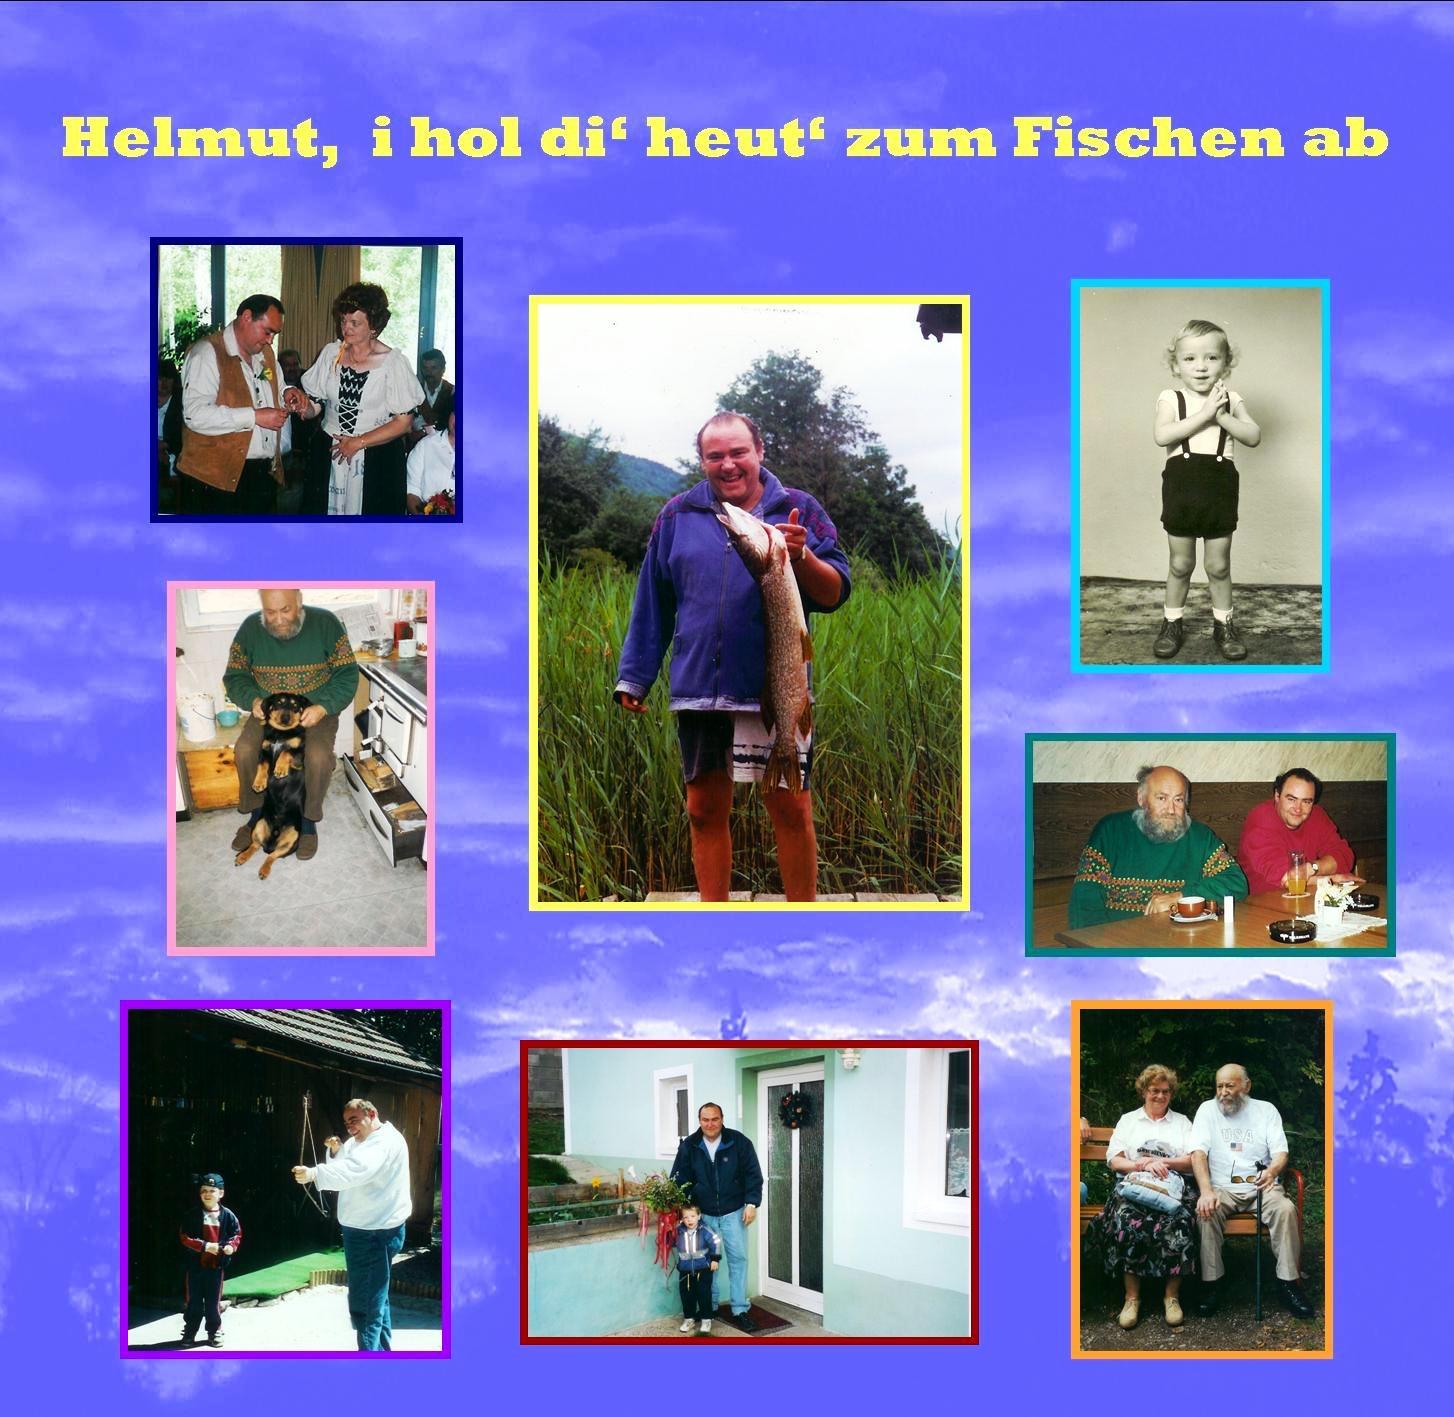 https://0501.nccdn.net/4_2/000/000/060/85f/Helmut--i-hol-di-heut-zum-Fischen-ab--Cover-vorne-.jpg